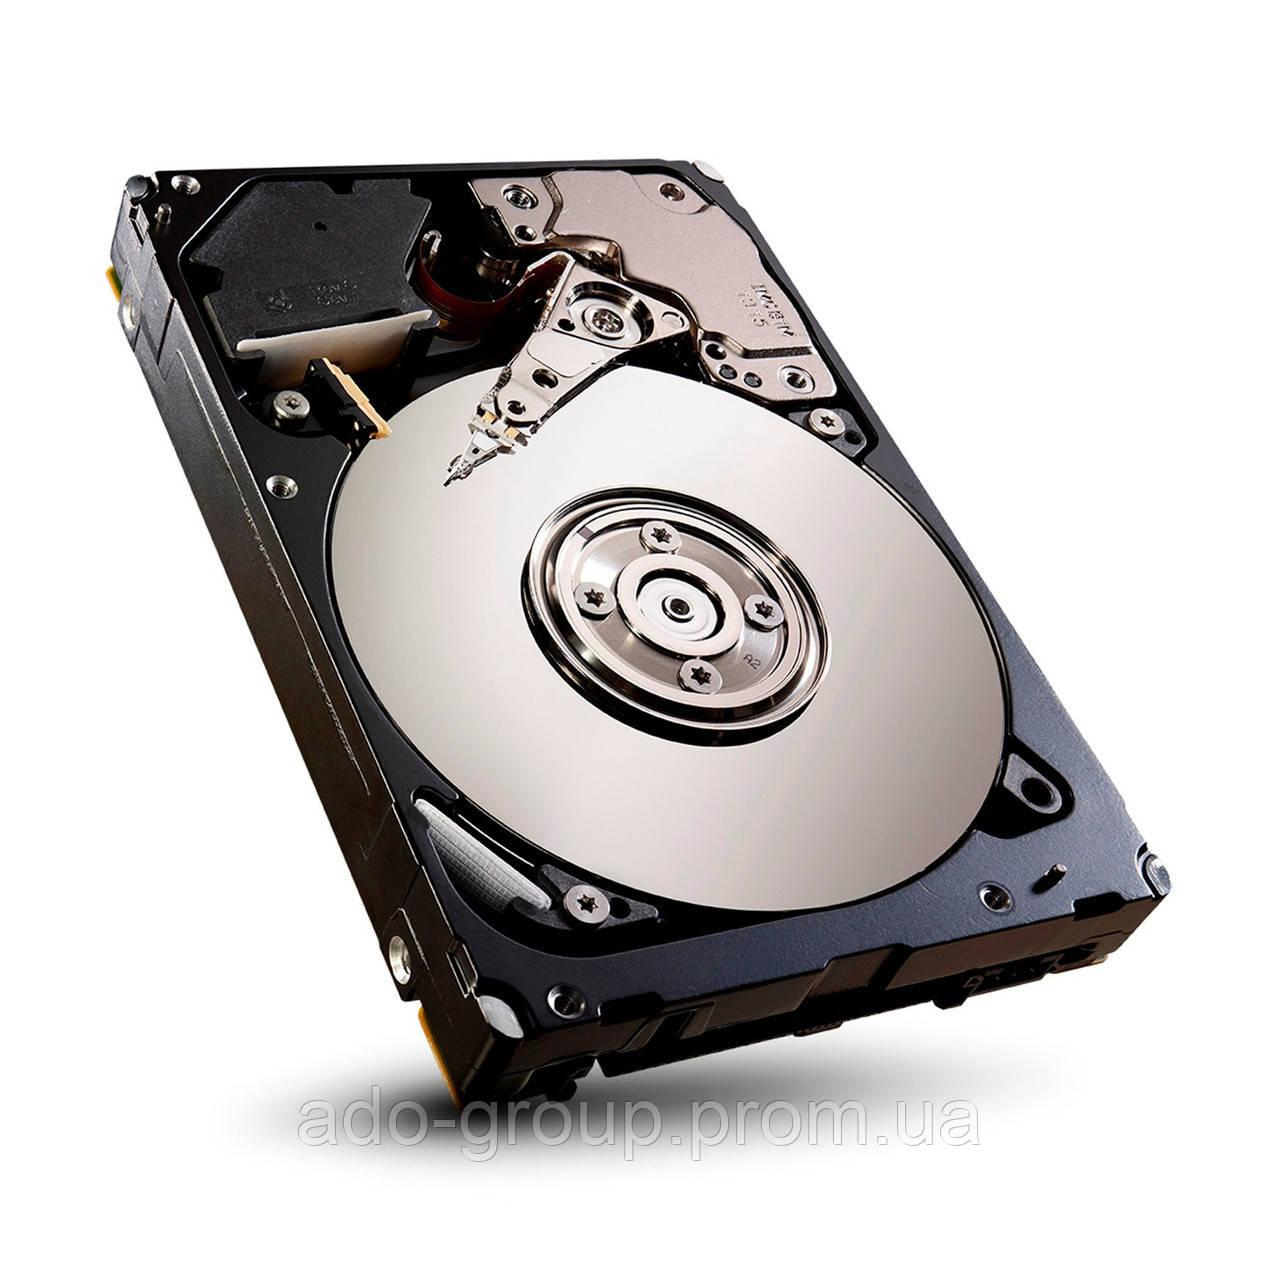 "0H995N Жесткий диск Dell 450GB SAS 15K  3.5"" +"